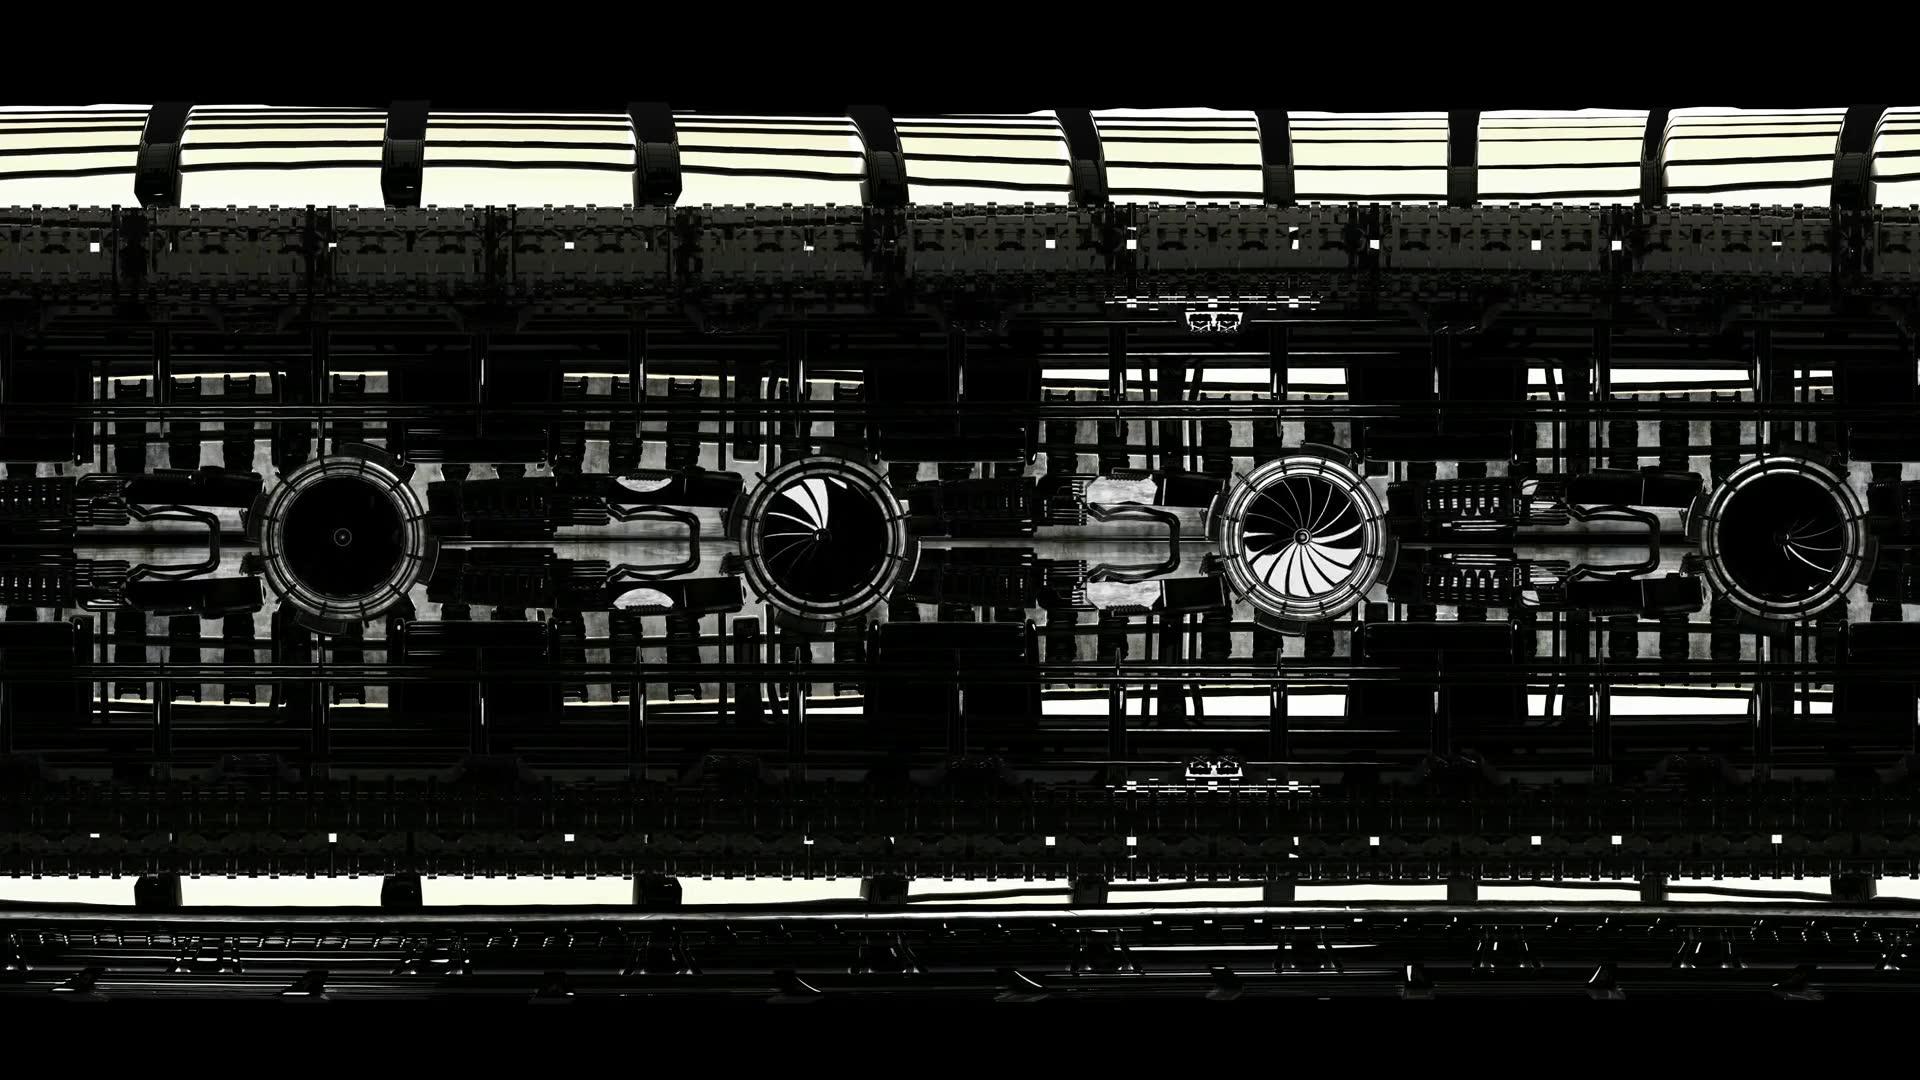 loop vr 360 animation inside metal reactor room background. virtual reality